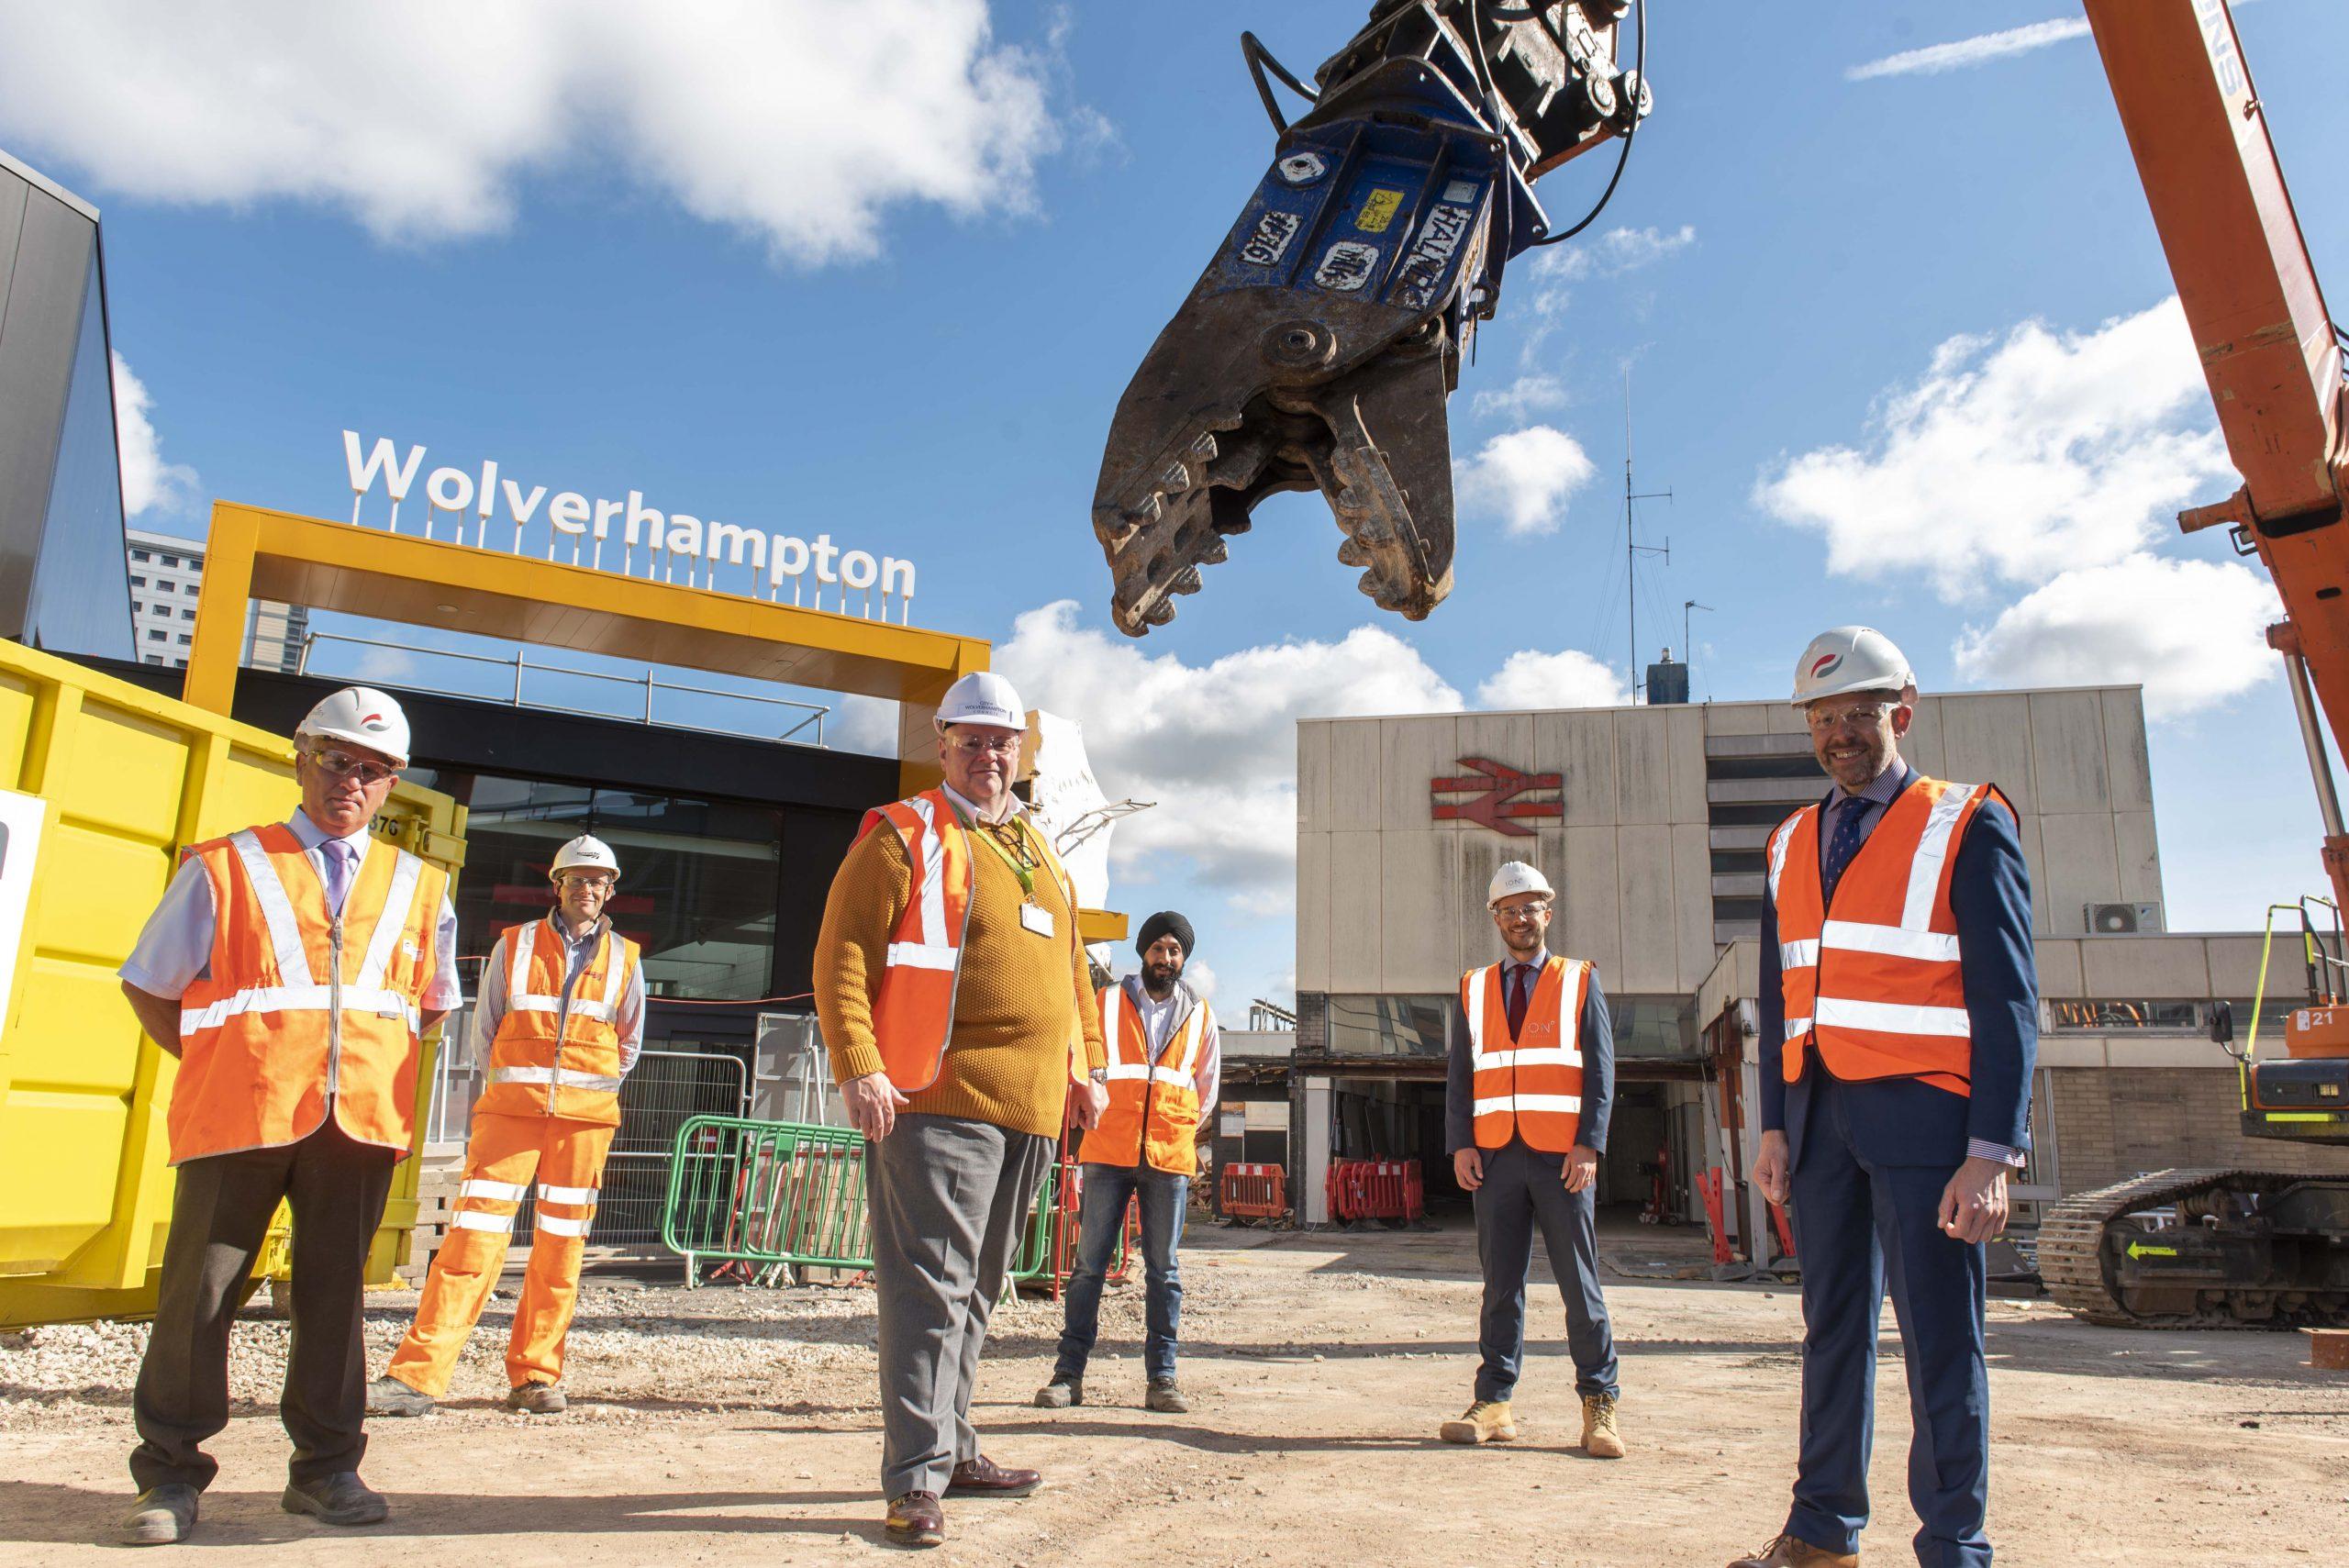 Historic day for Wolverhampton Railway Station scheme